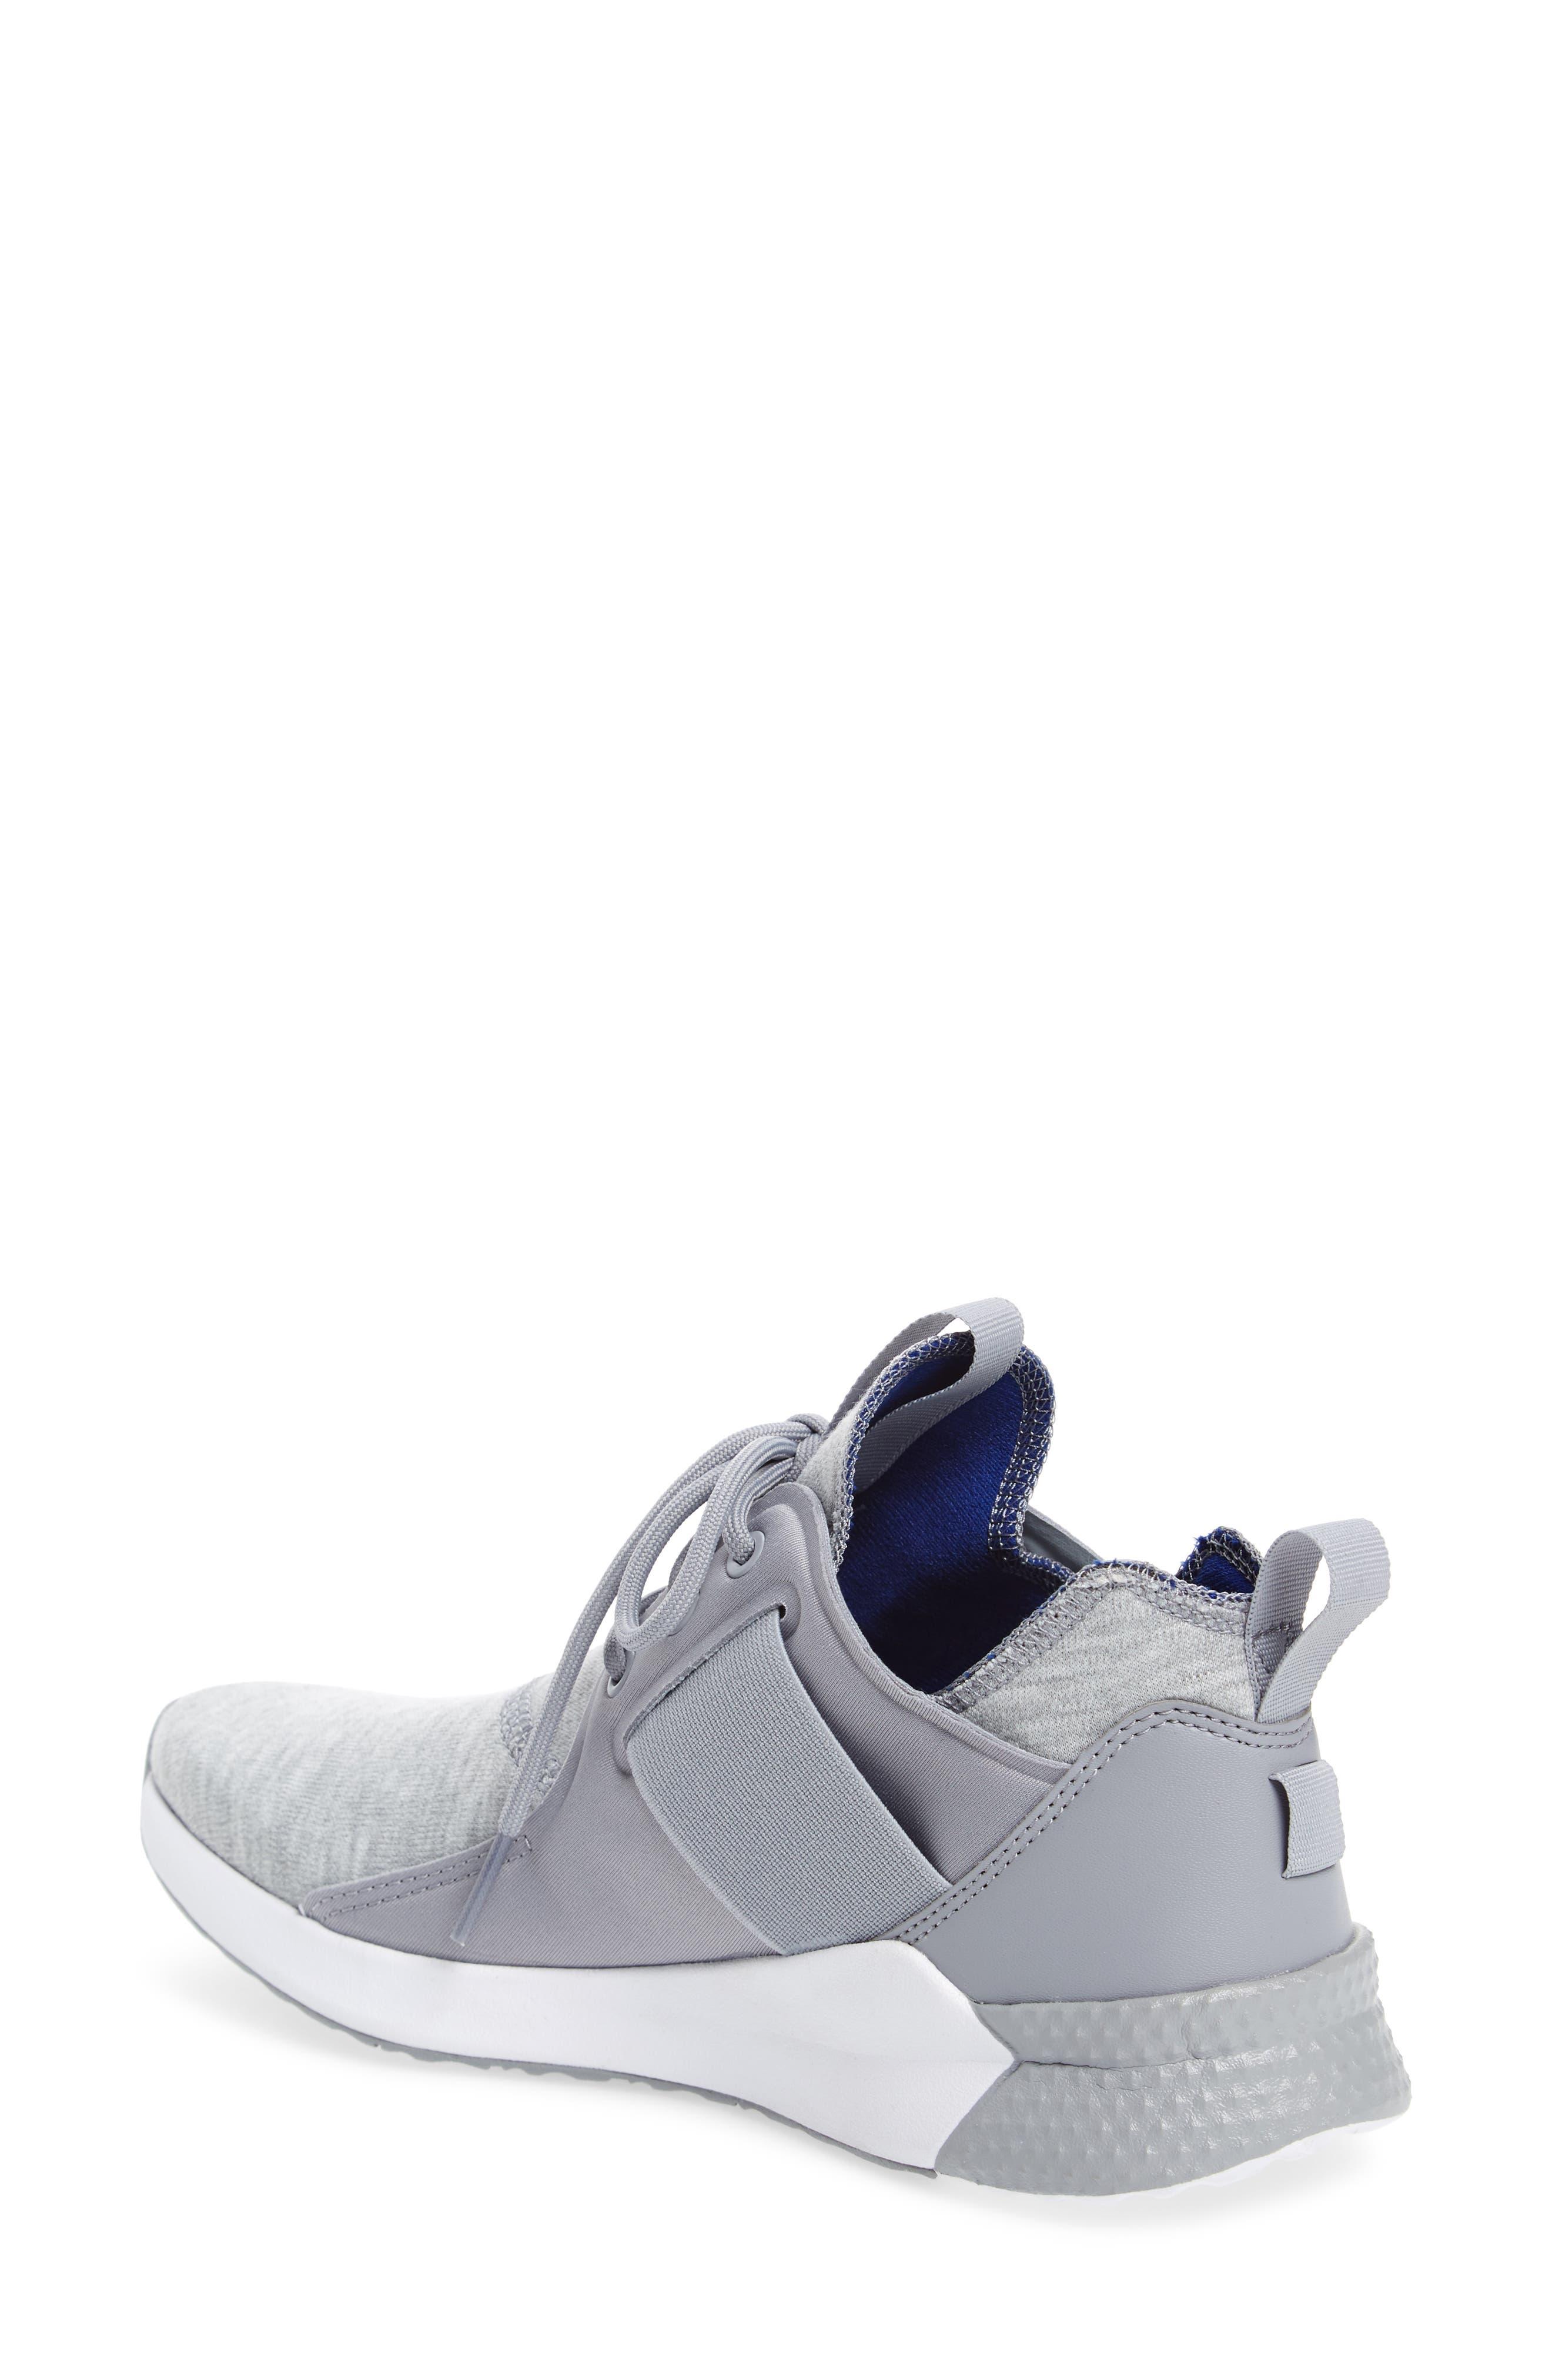 Guresu 1.0 Training Shoe,                             Alternate thumbnail 7, color,